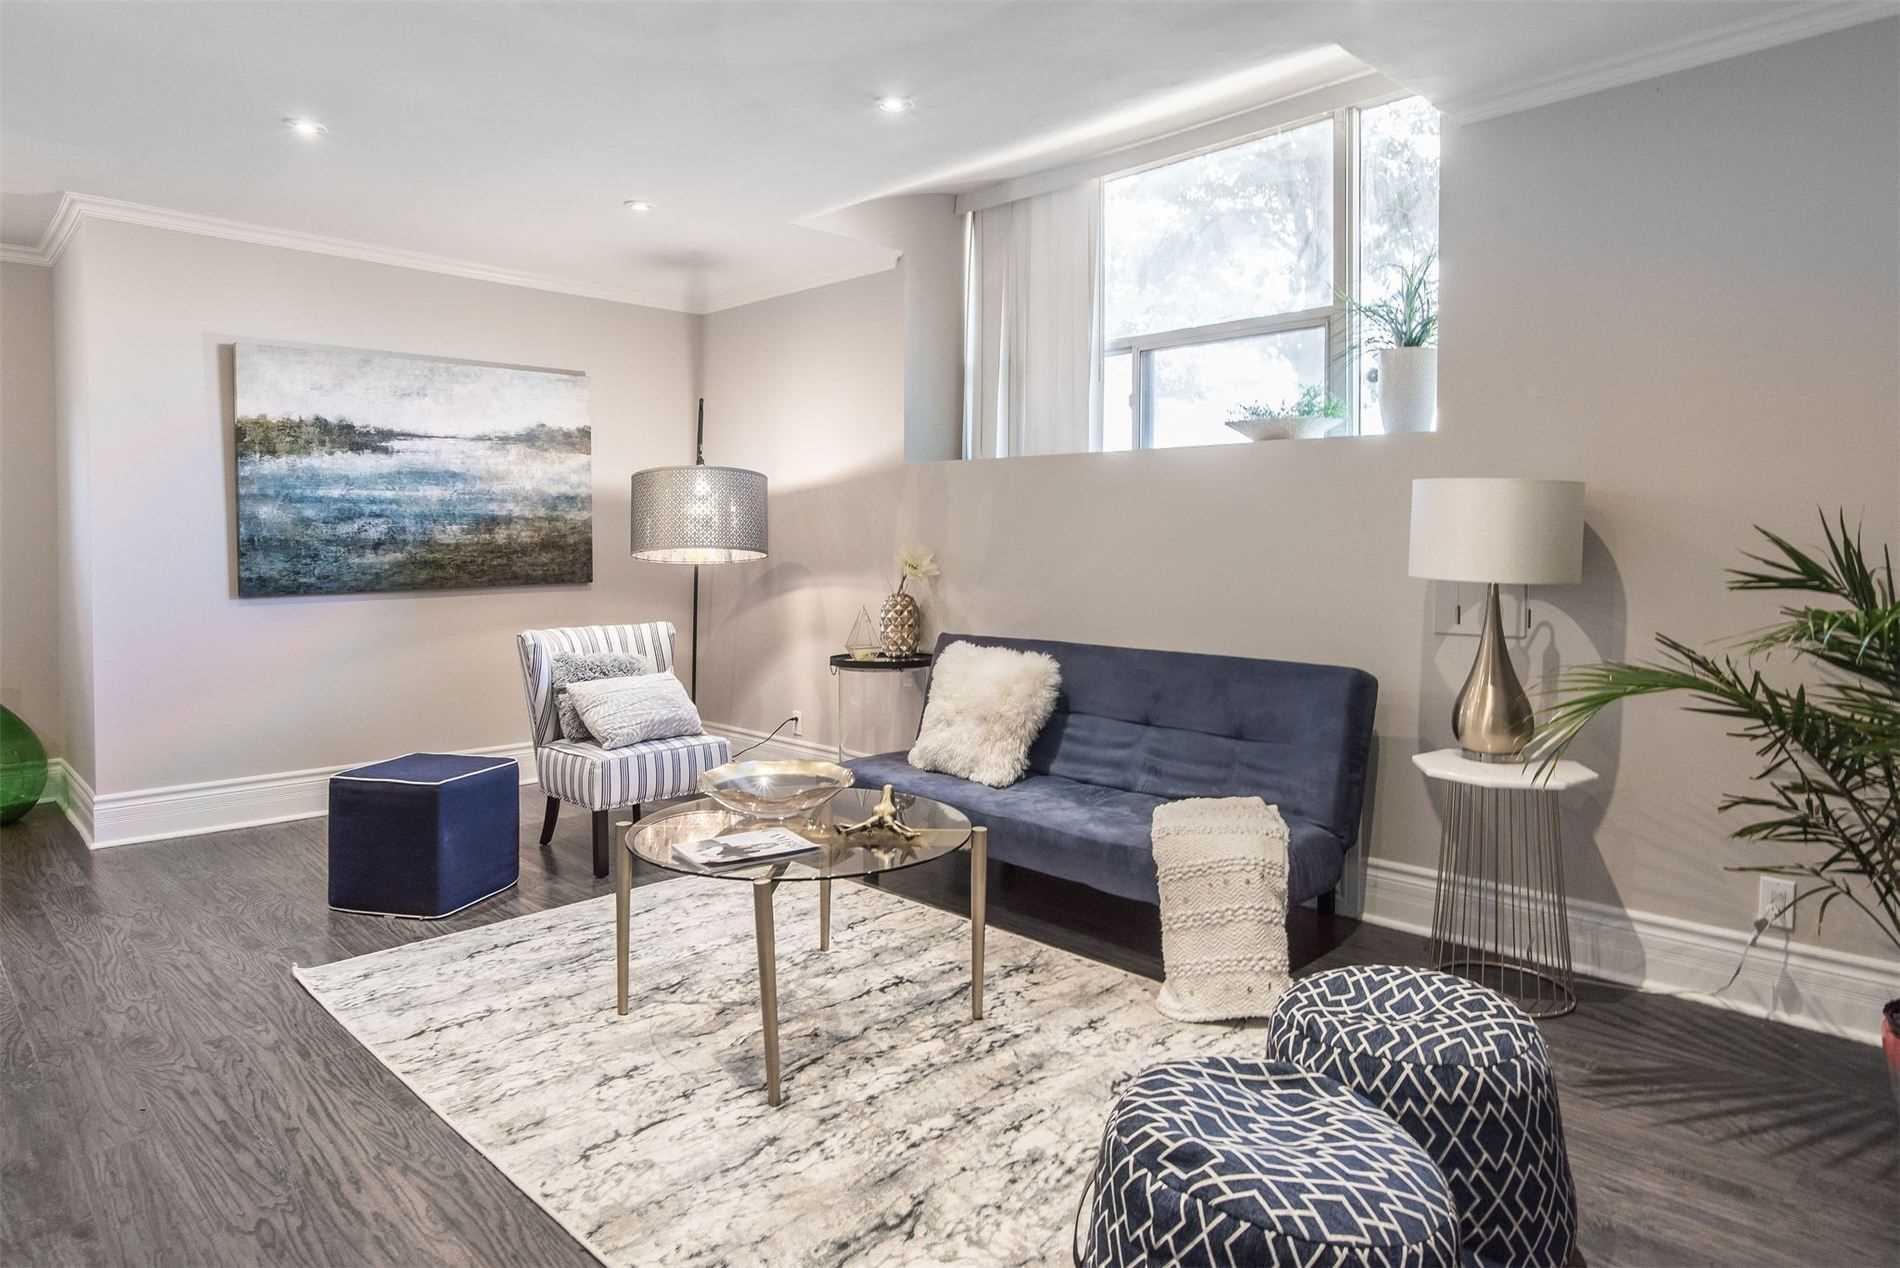 6 - 2550 Bathurst St - Forest Hill North Co-Ownership Apt for sale, 1 Bedroom (C5381382) - #1